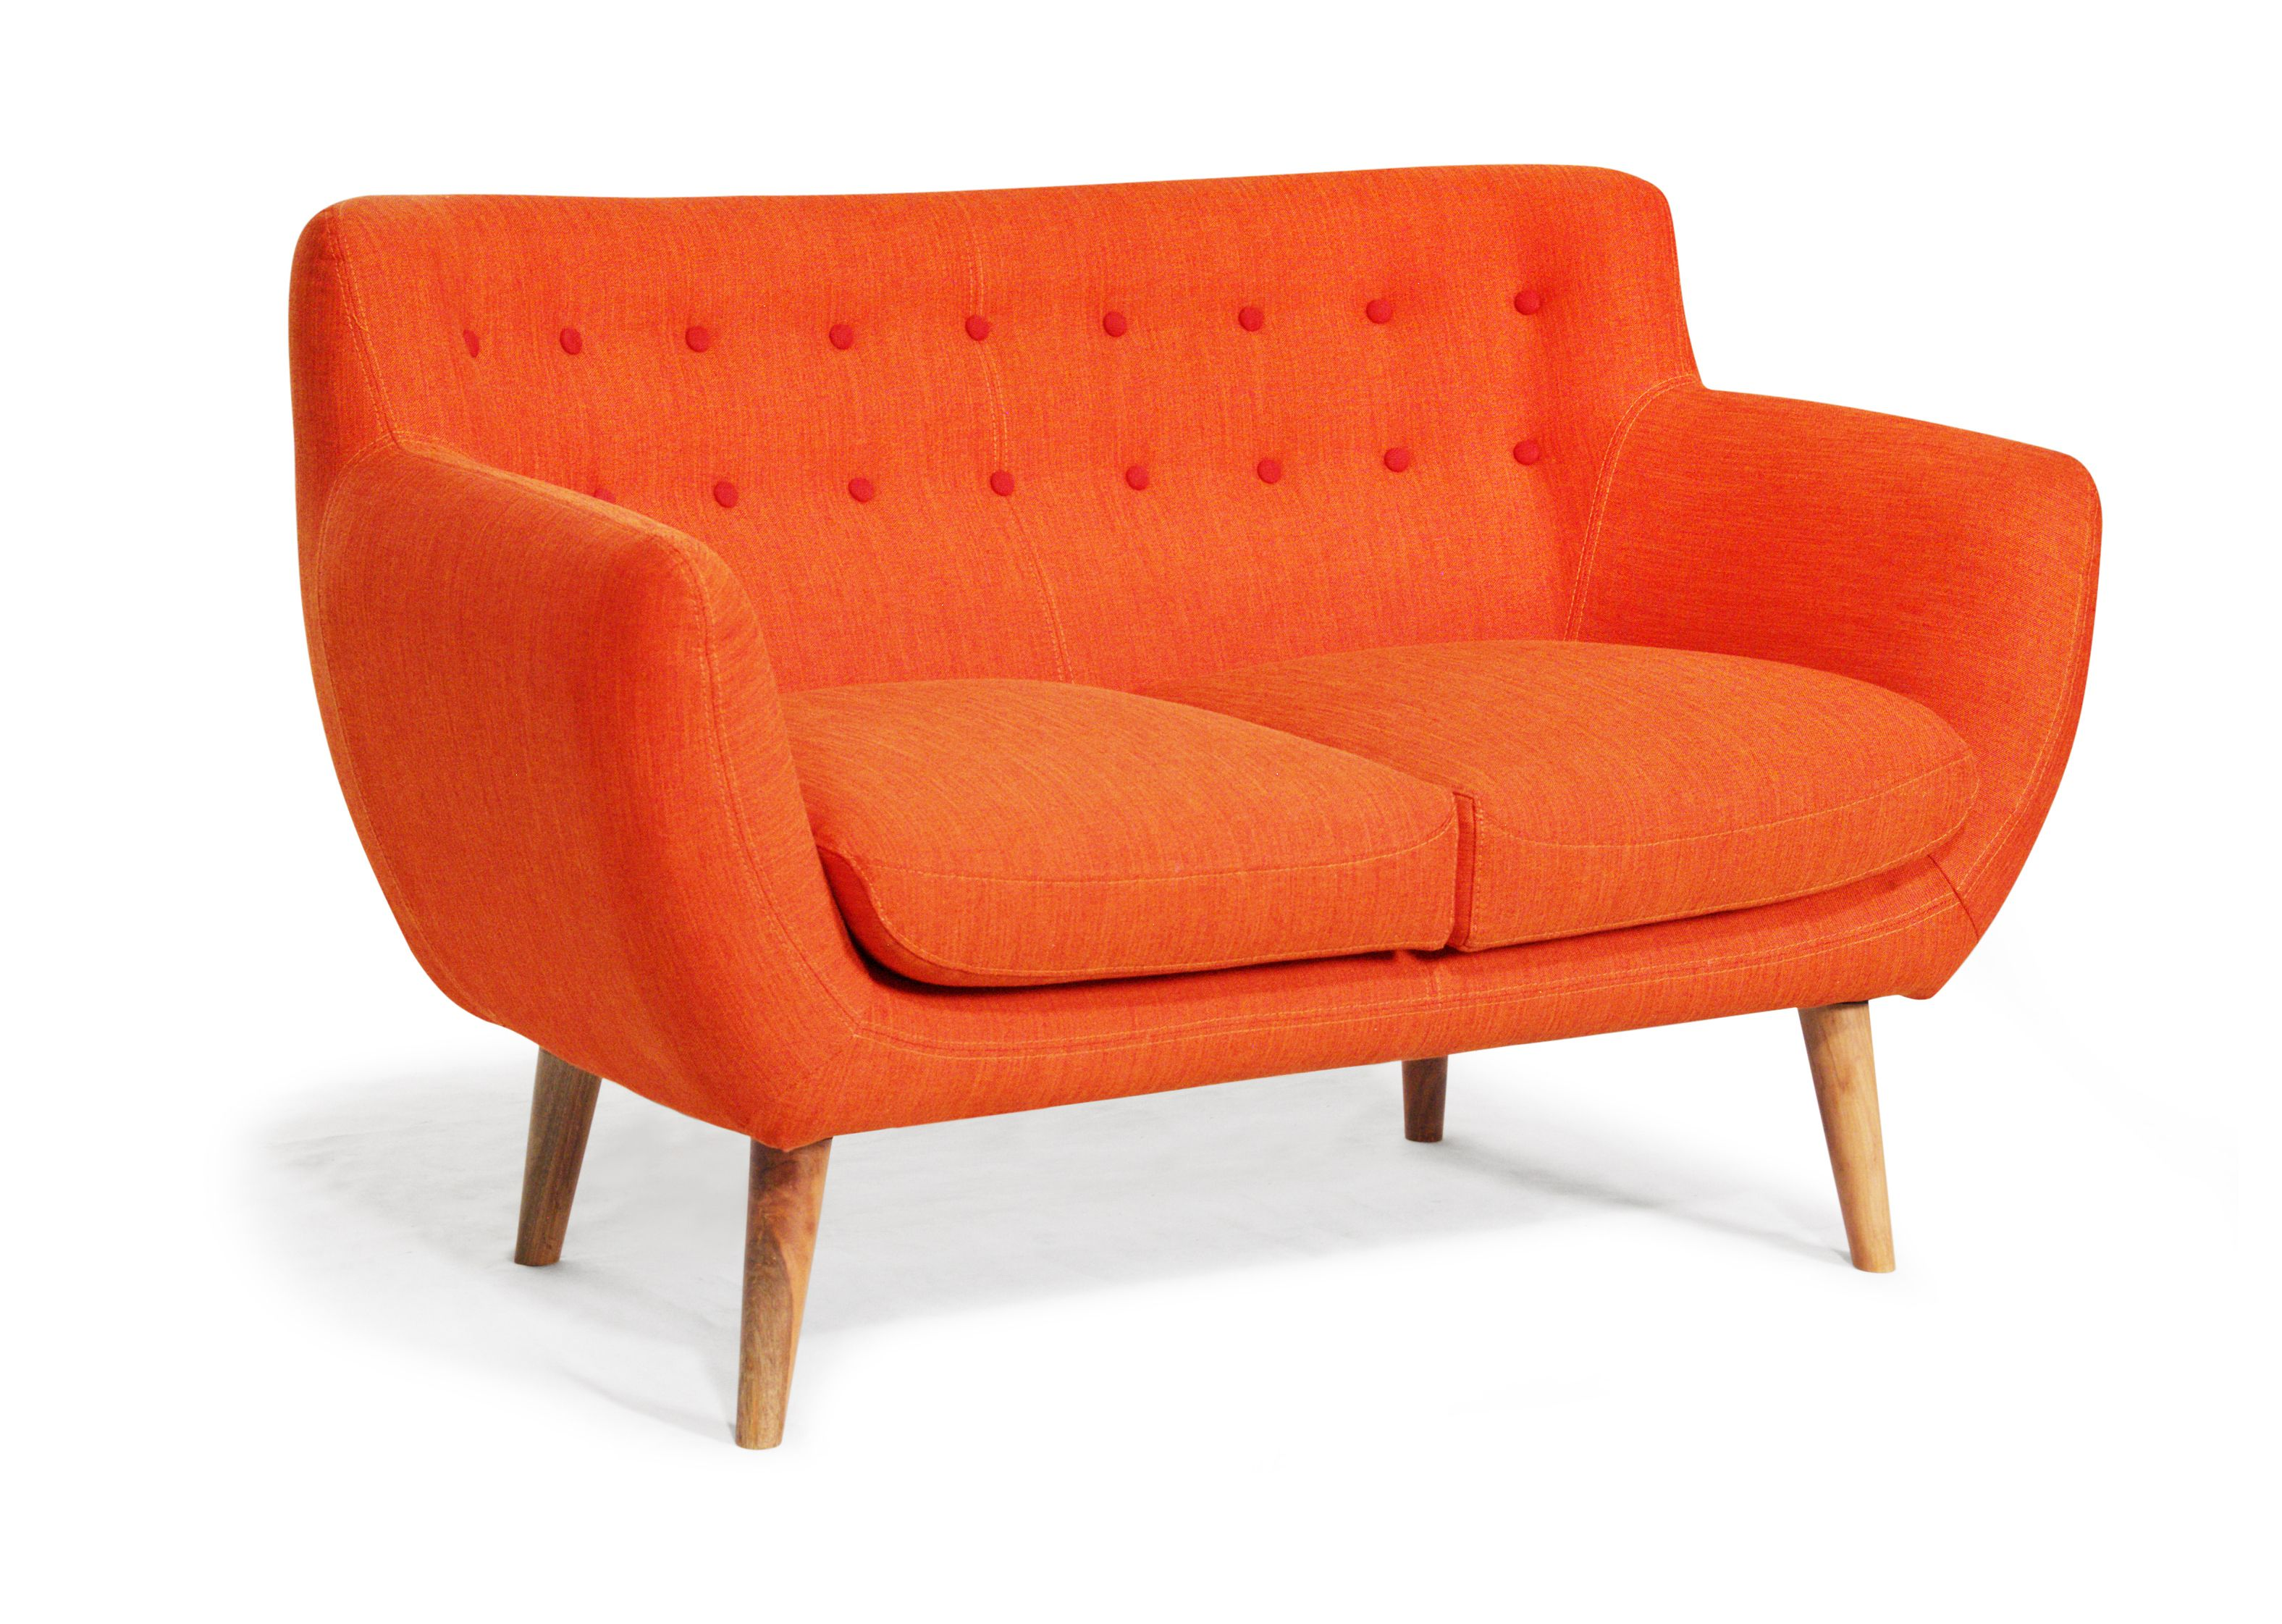 Orange Furniture Dashing Sofa For Enjoyable Living Room Design Ideas